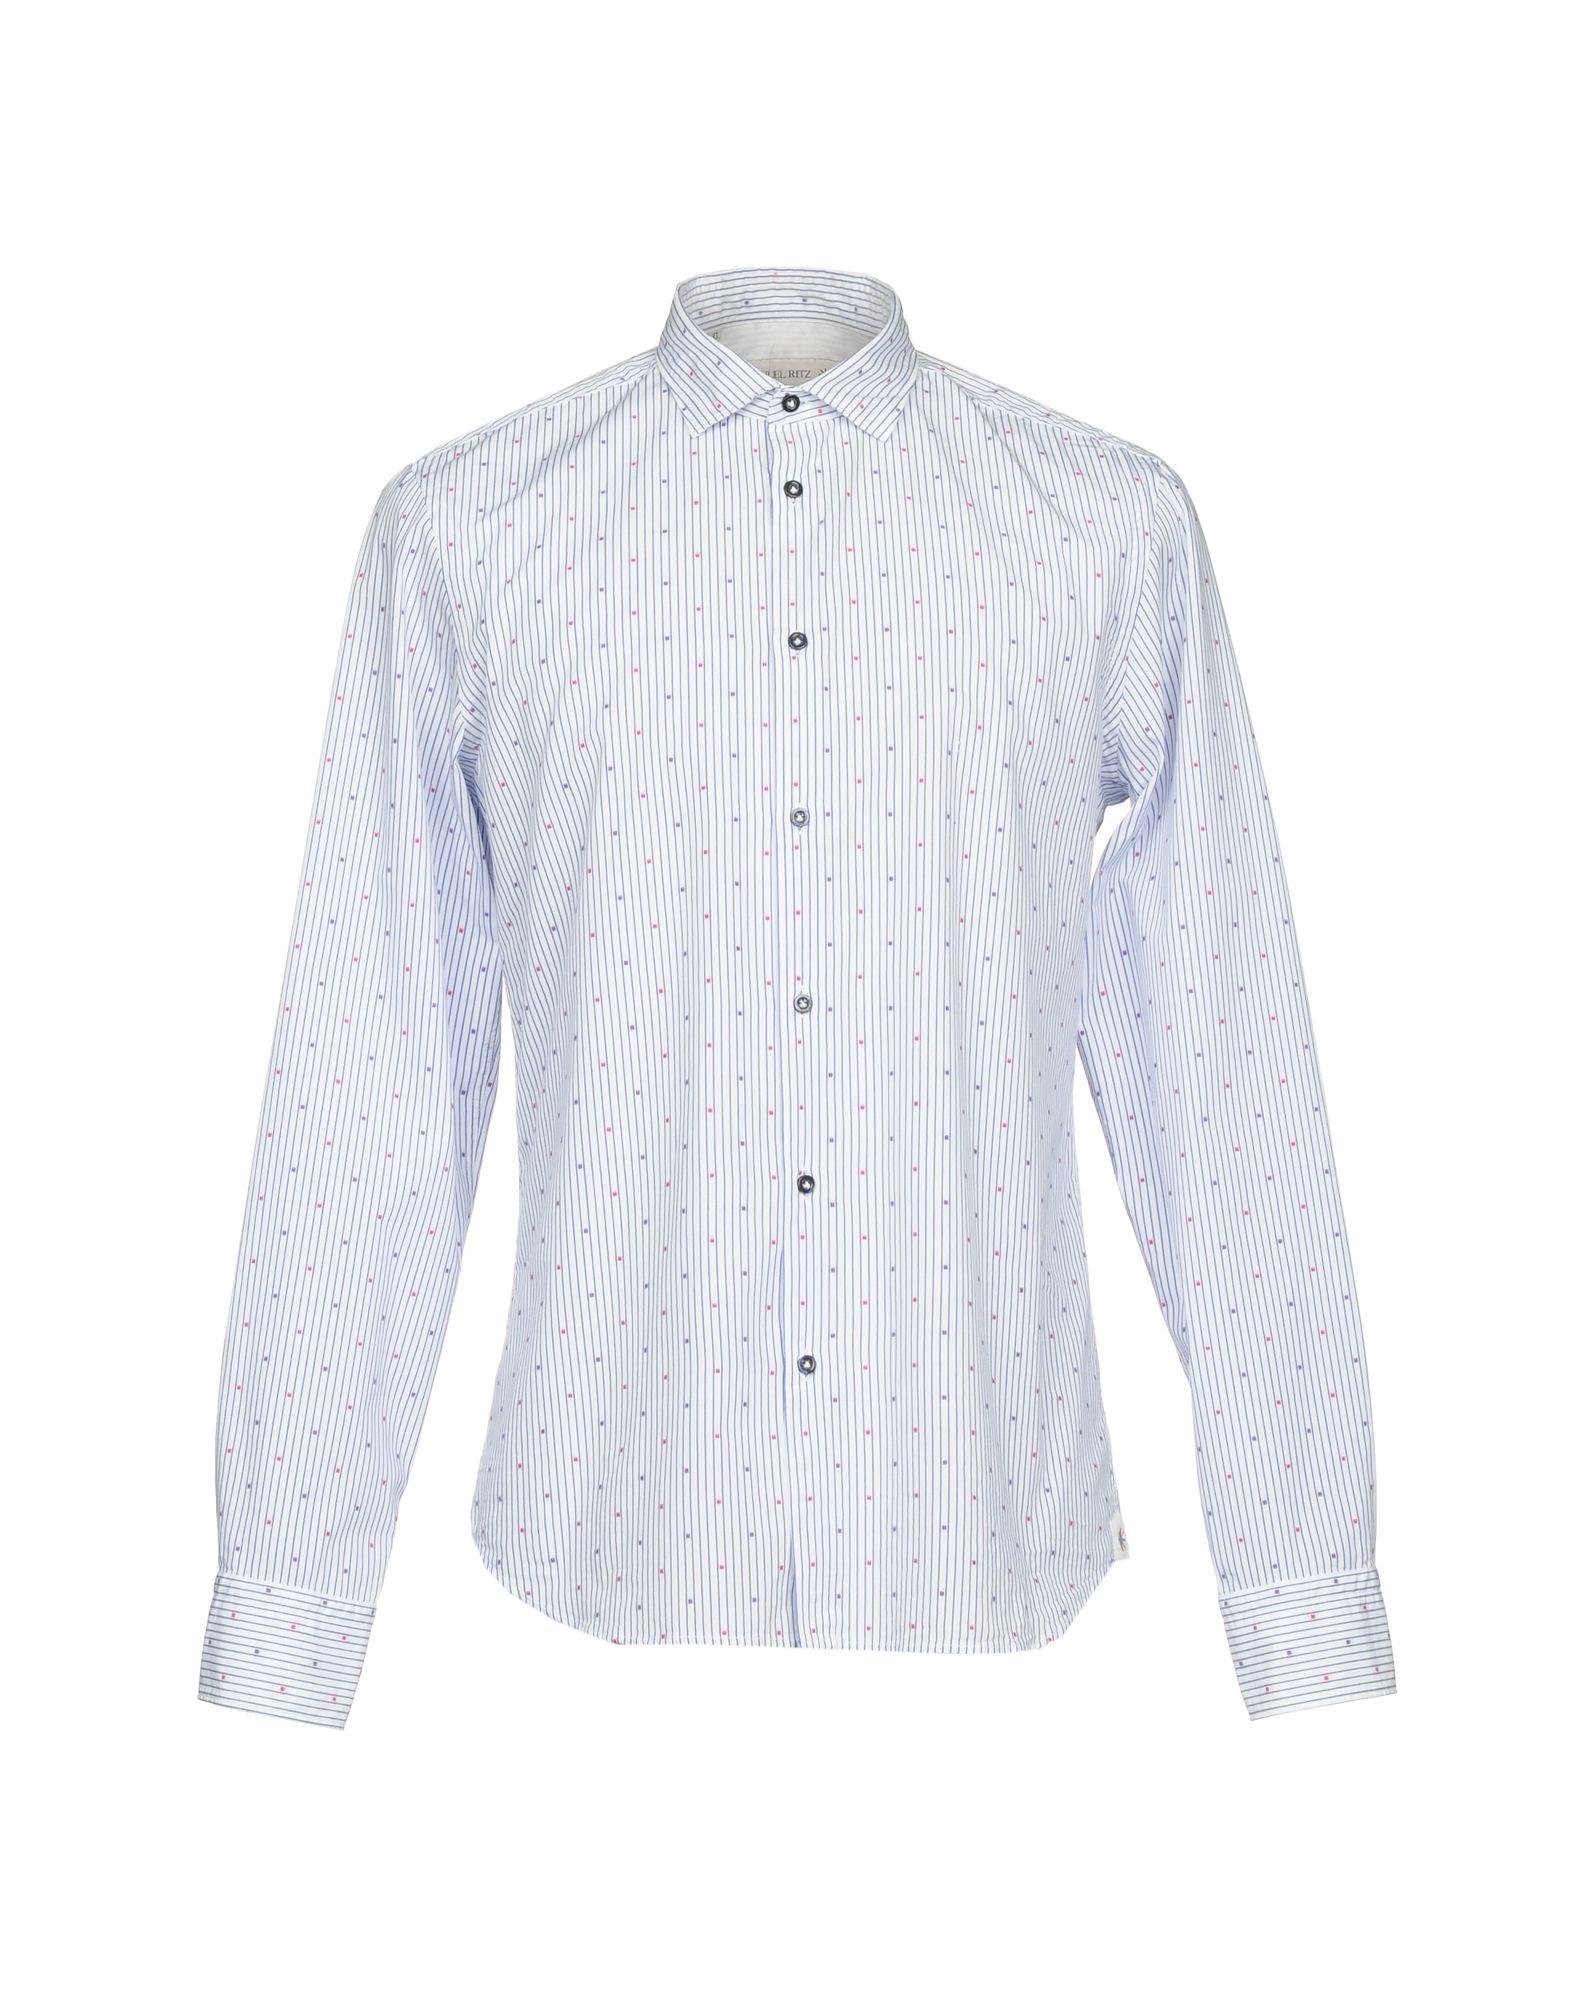 MANUEL RITZ Herren Hemd Farbe Blau Größe 8